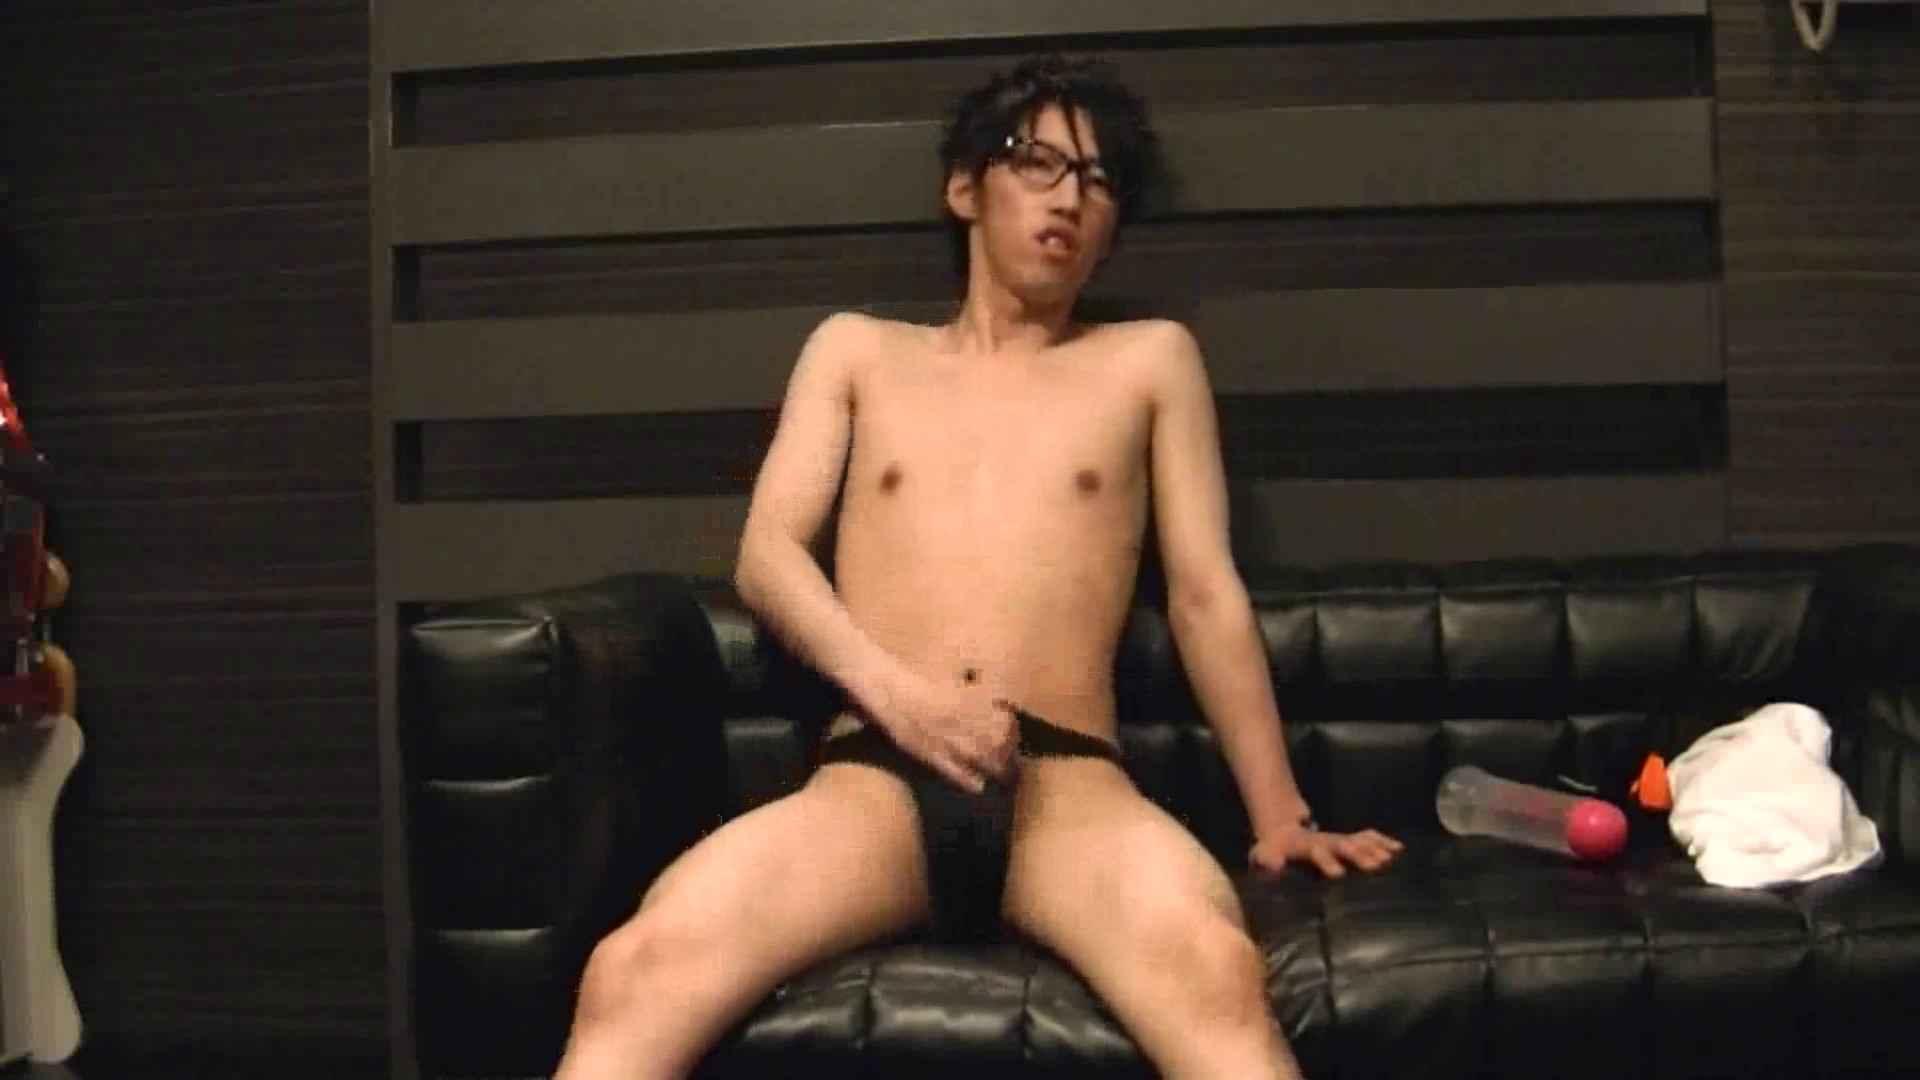 ONA見せカーニバル!! Vol3 モザ無し ゲイ無修正画像 87枚 51